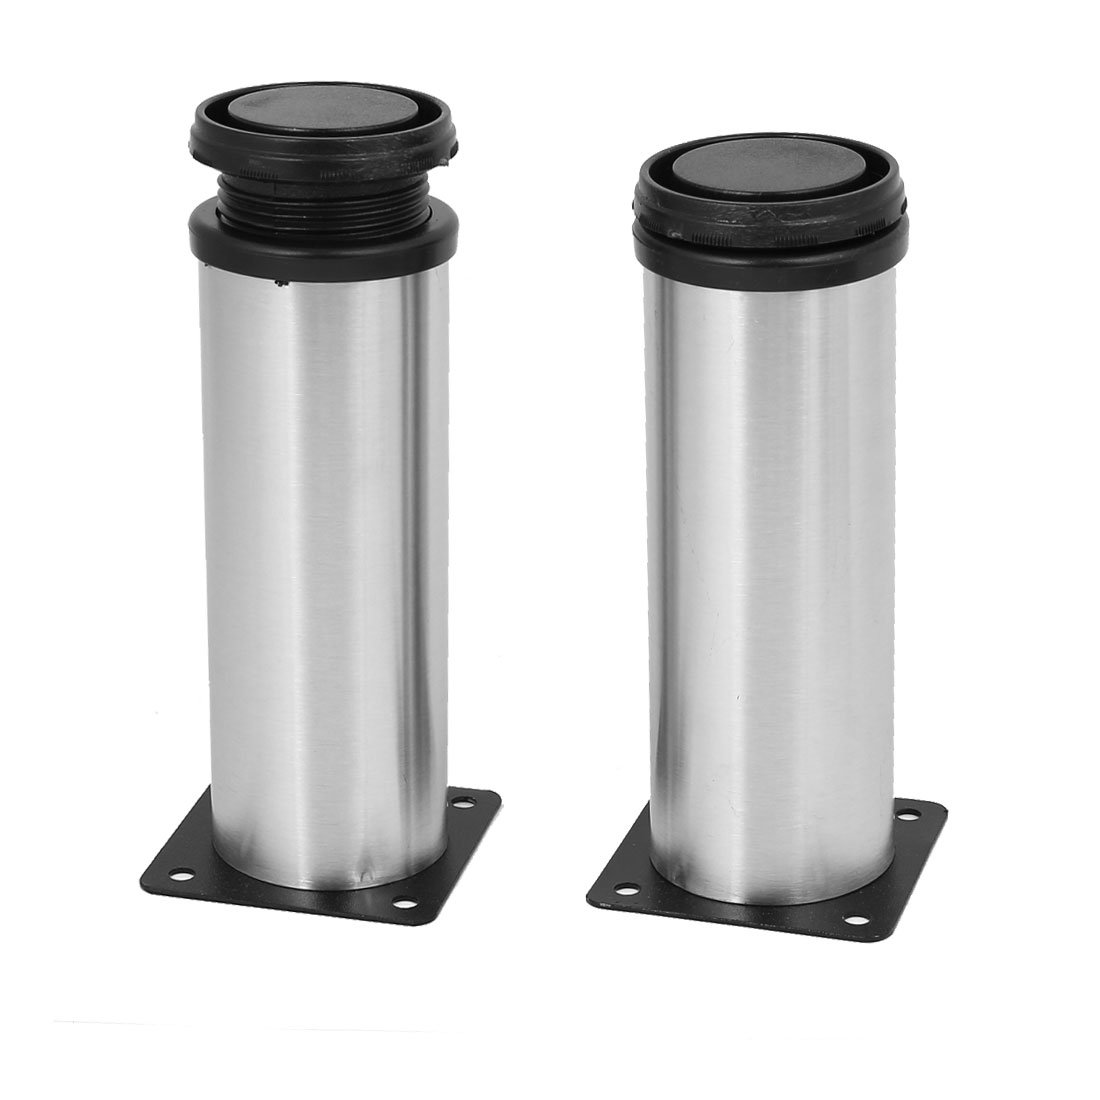 uxcell Bathroom Cabinet 50mm x 150mm Metal Adjustable Leg Feet Round Stand 2PCS